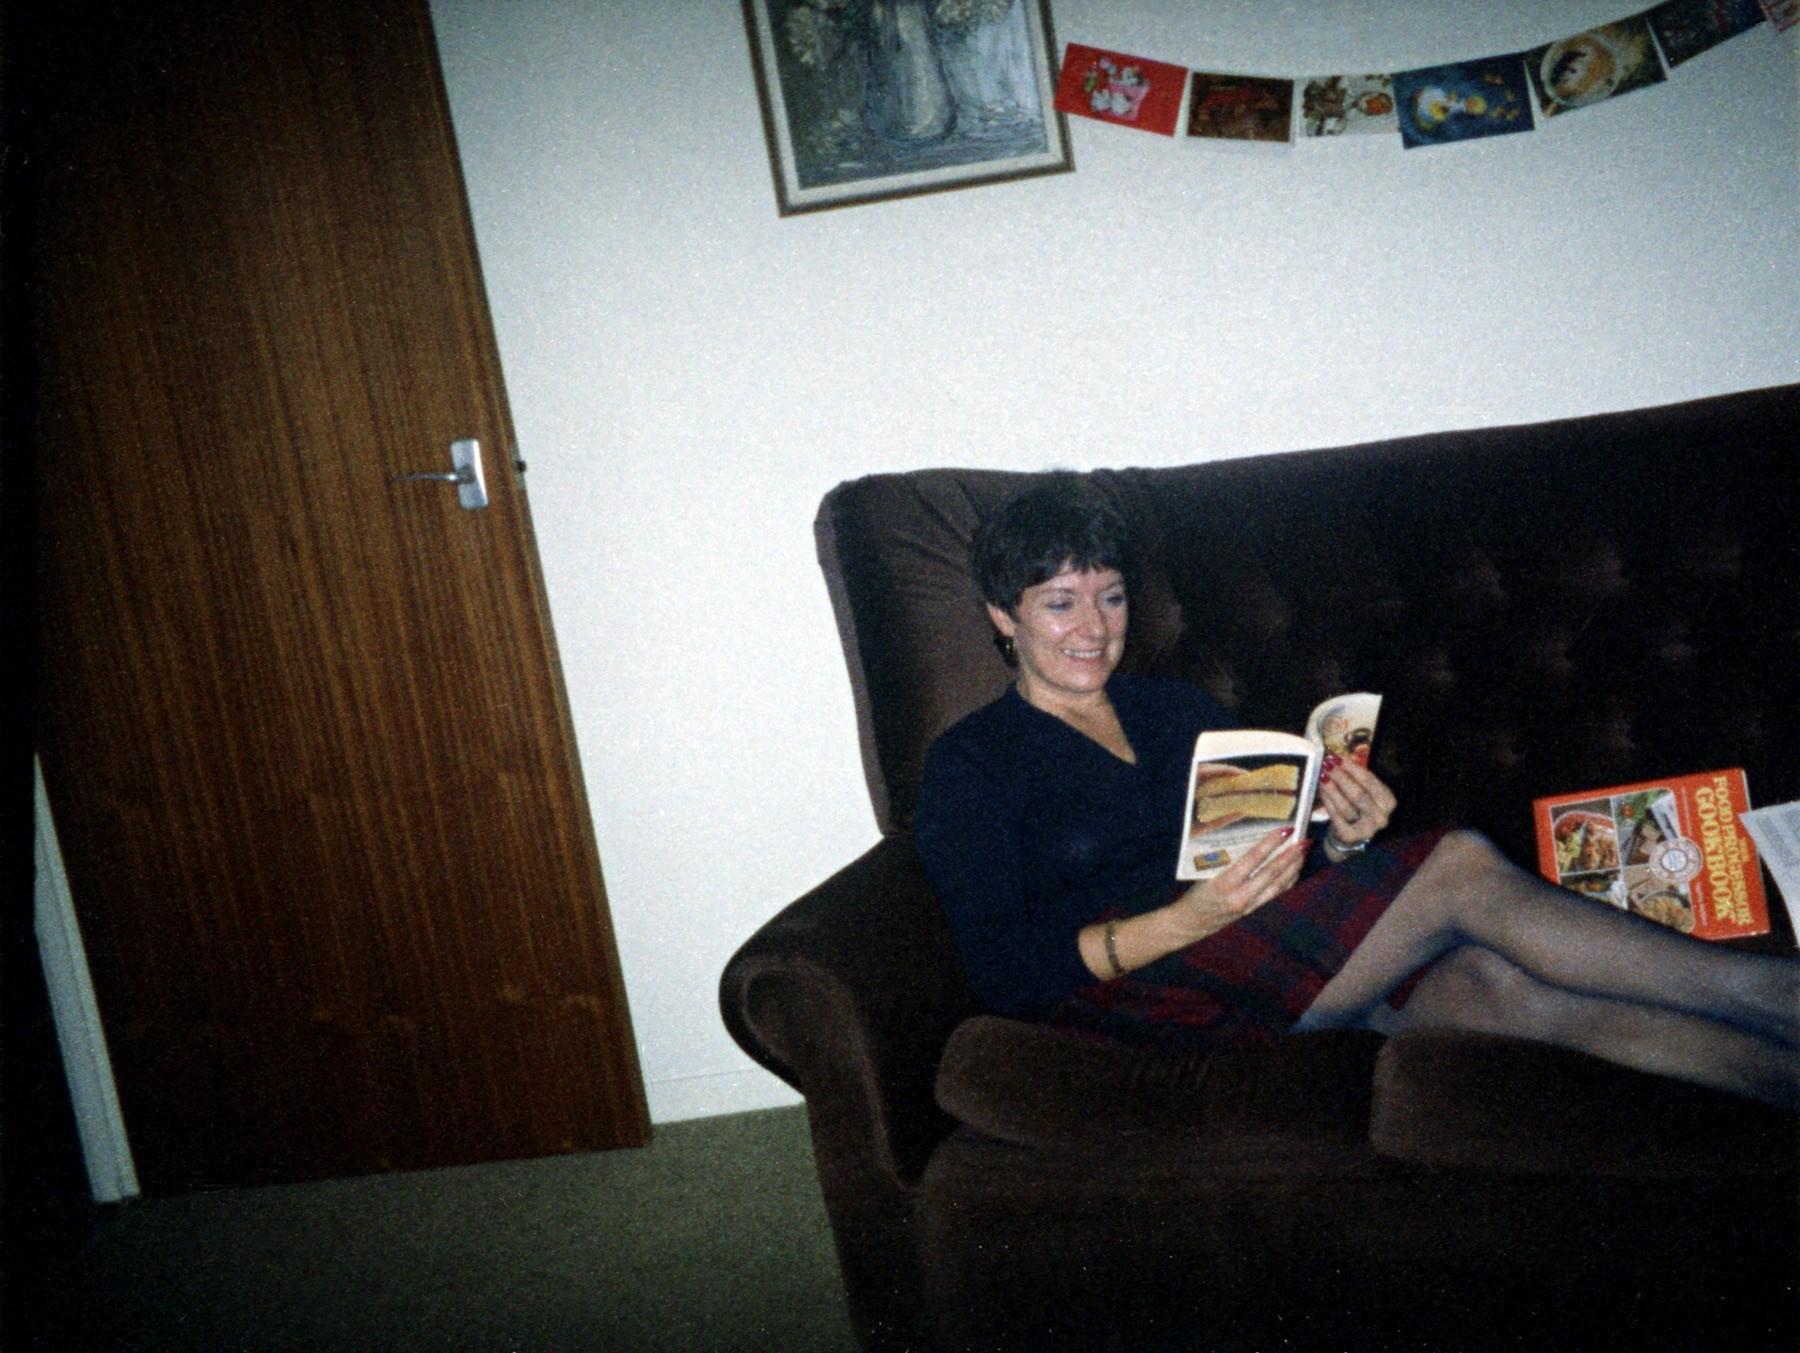 Ann Tinworth on Christmas Day 1983.